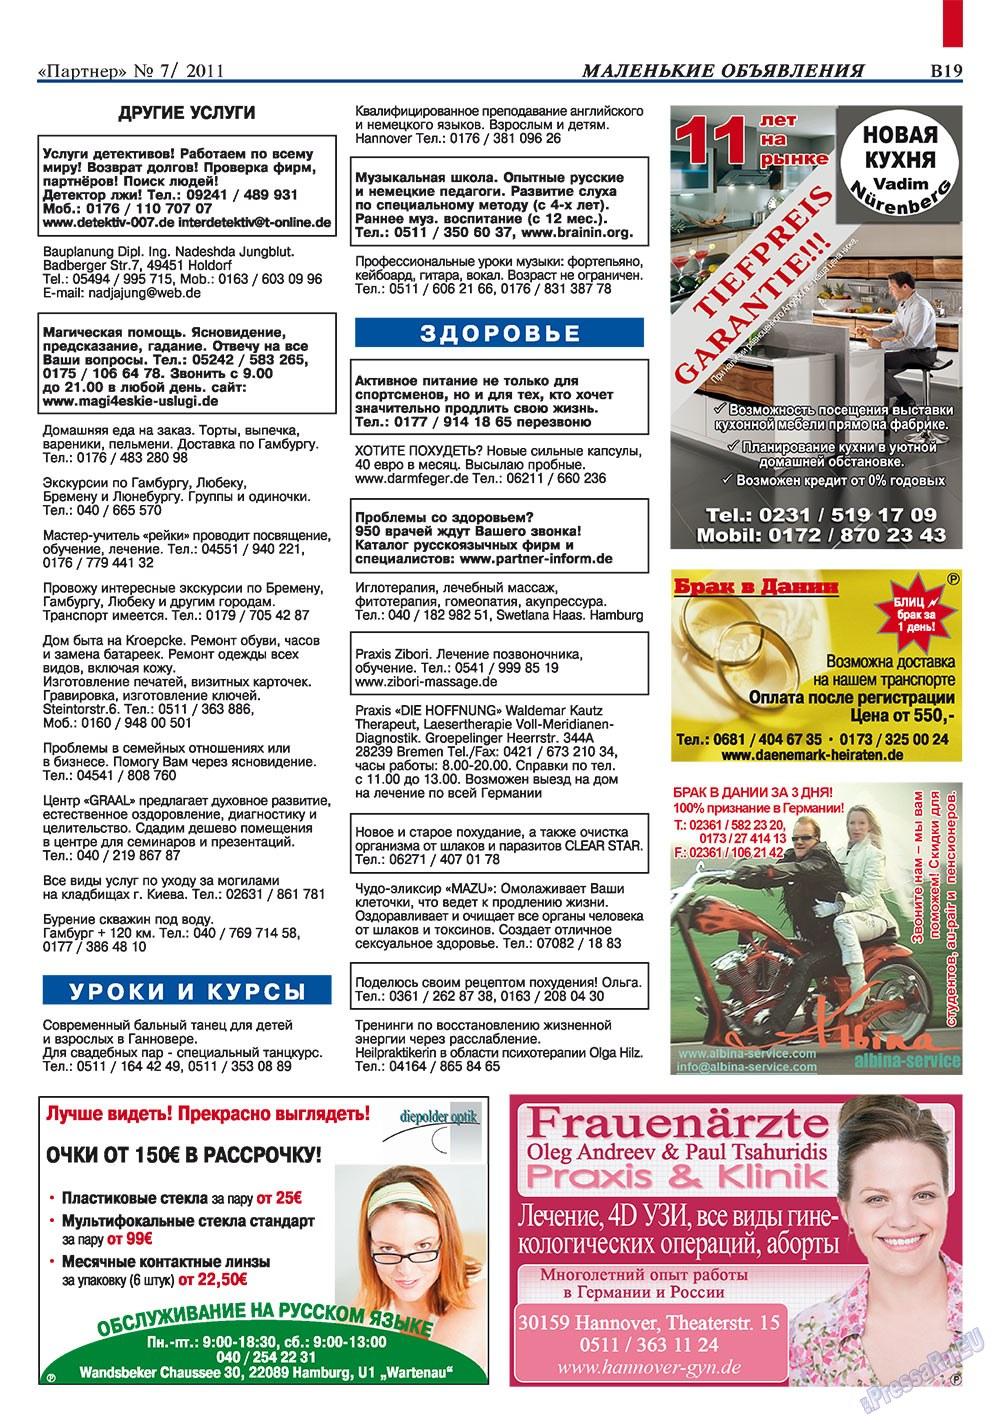 Партнер-север (журнал). 2011 год, номер 7, стр. 29